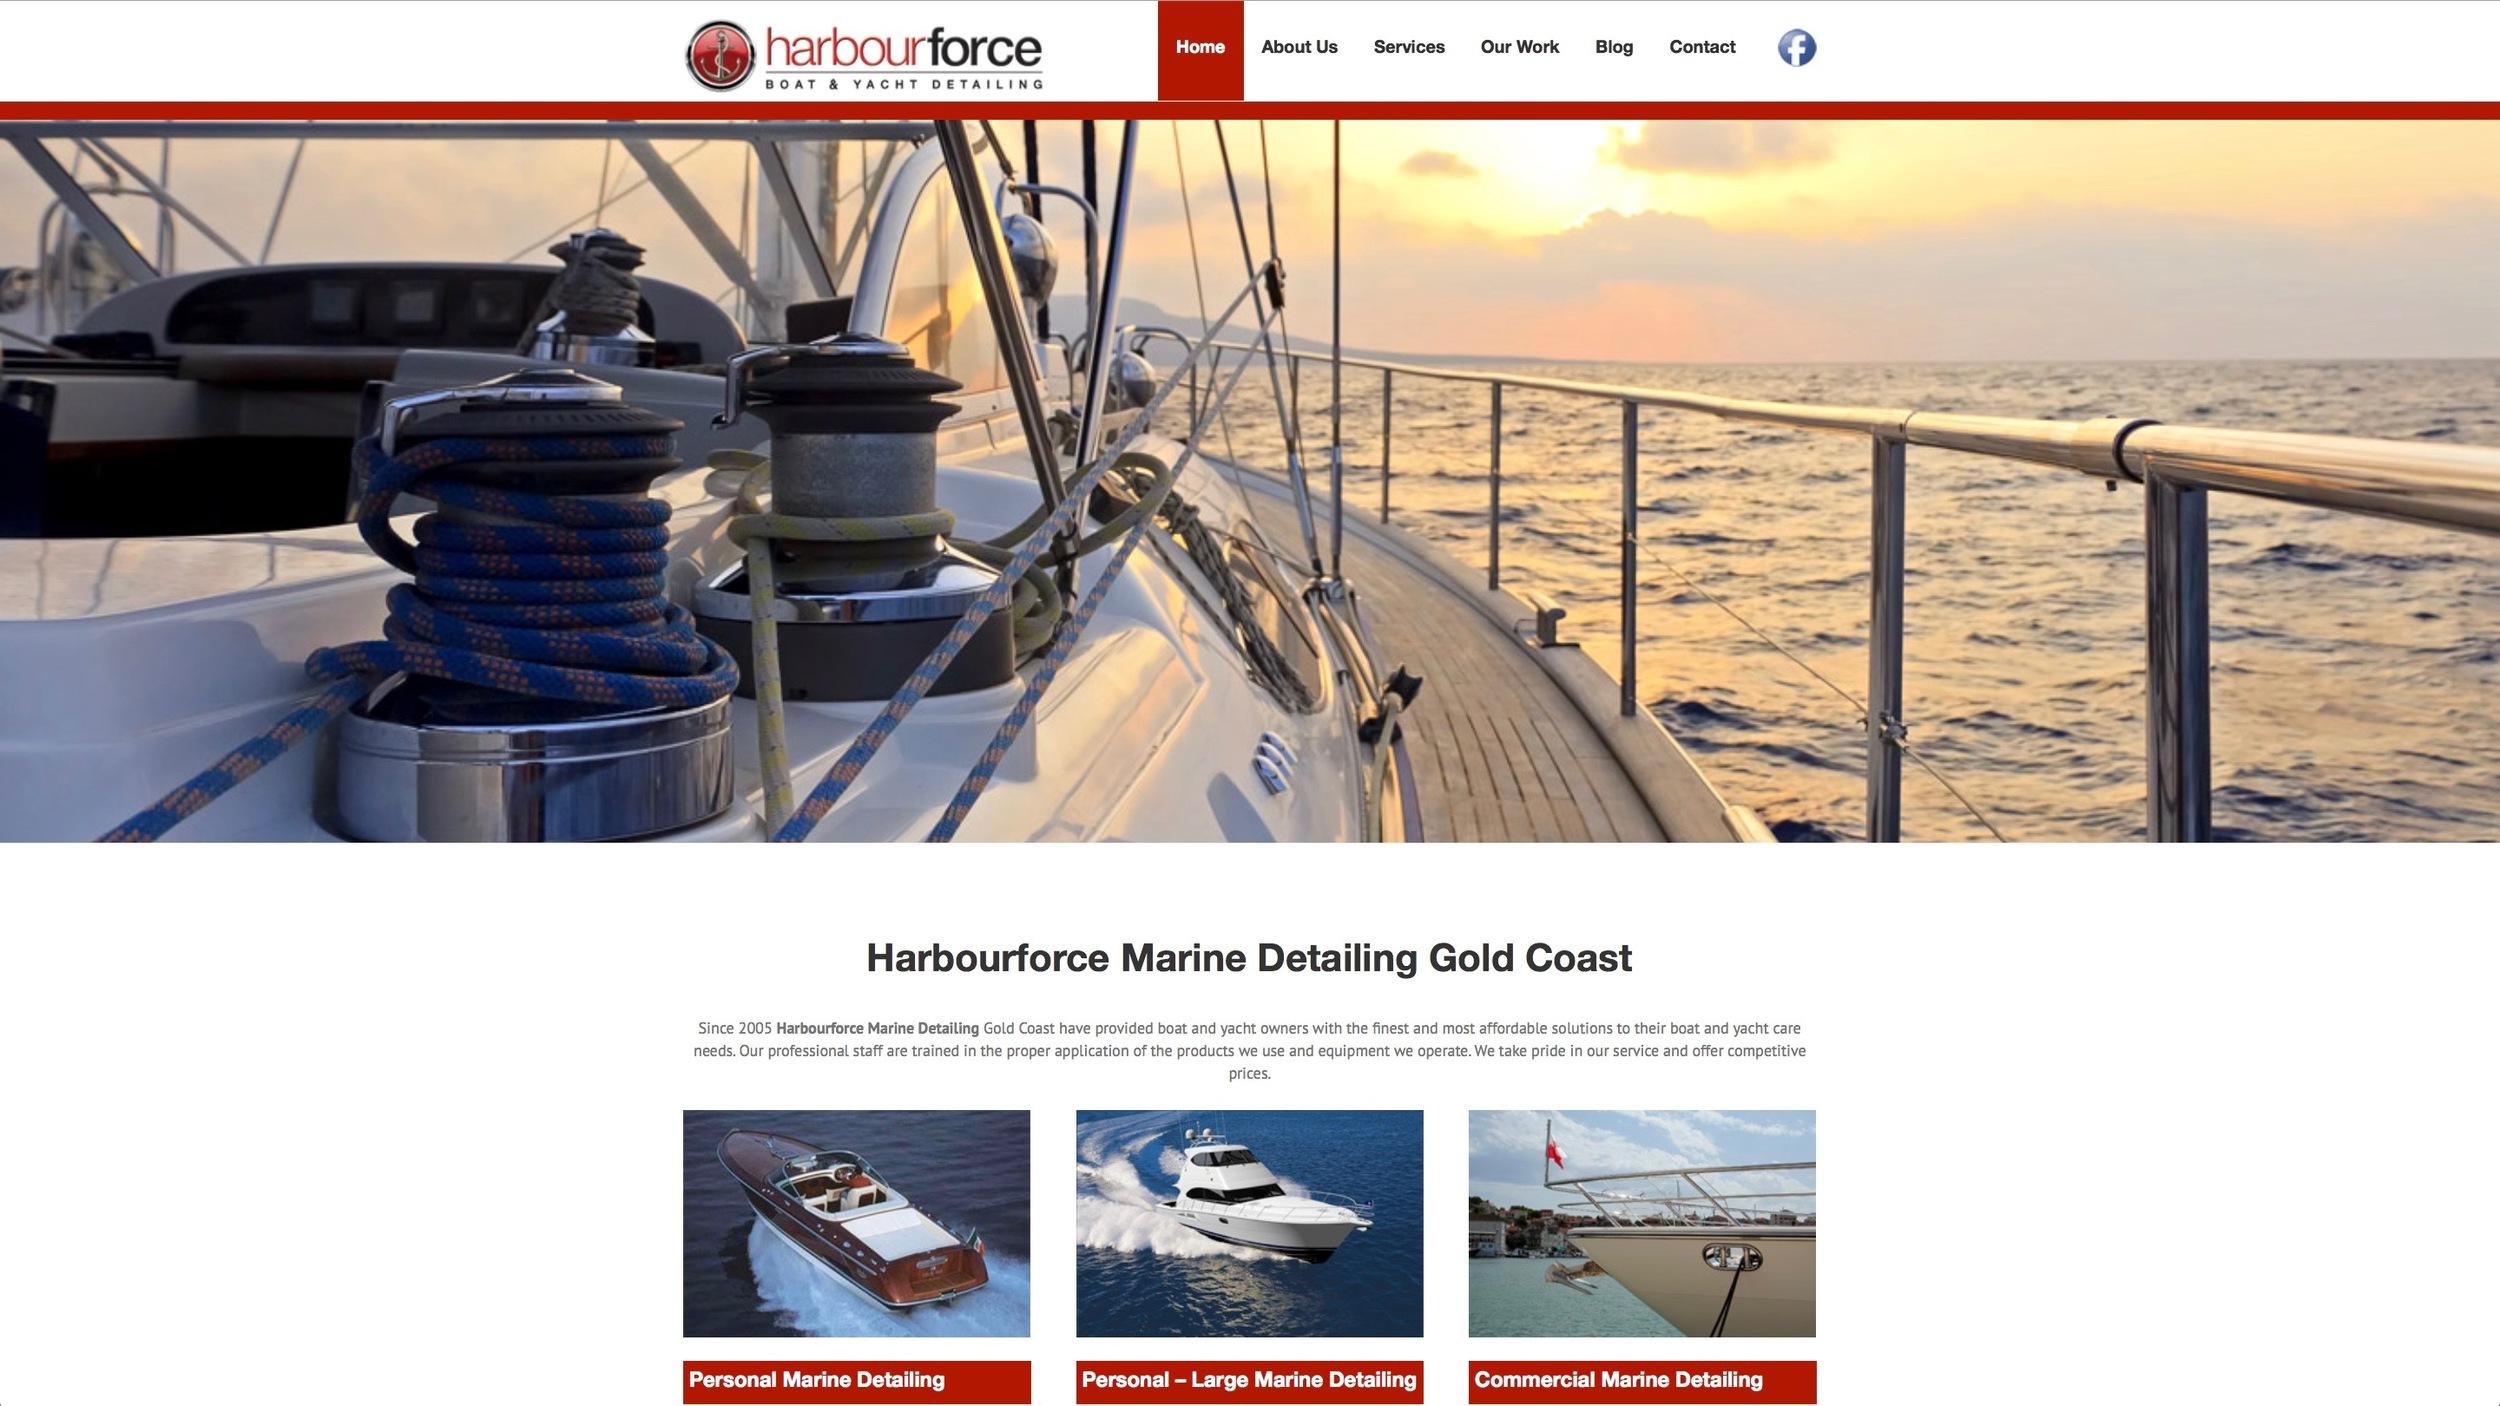 http://harbourforce.com.au